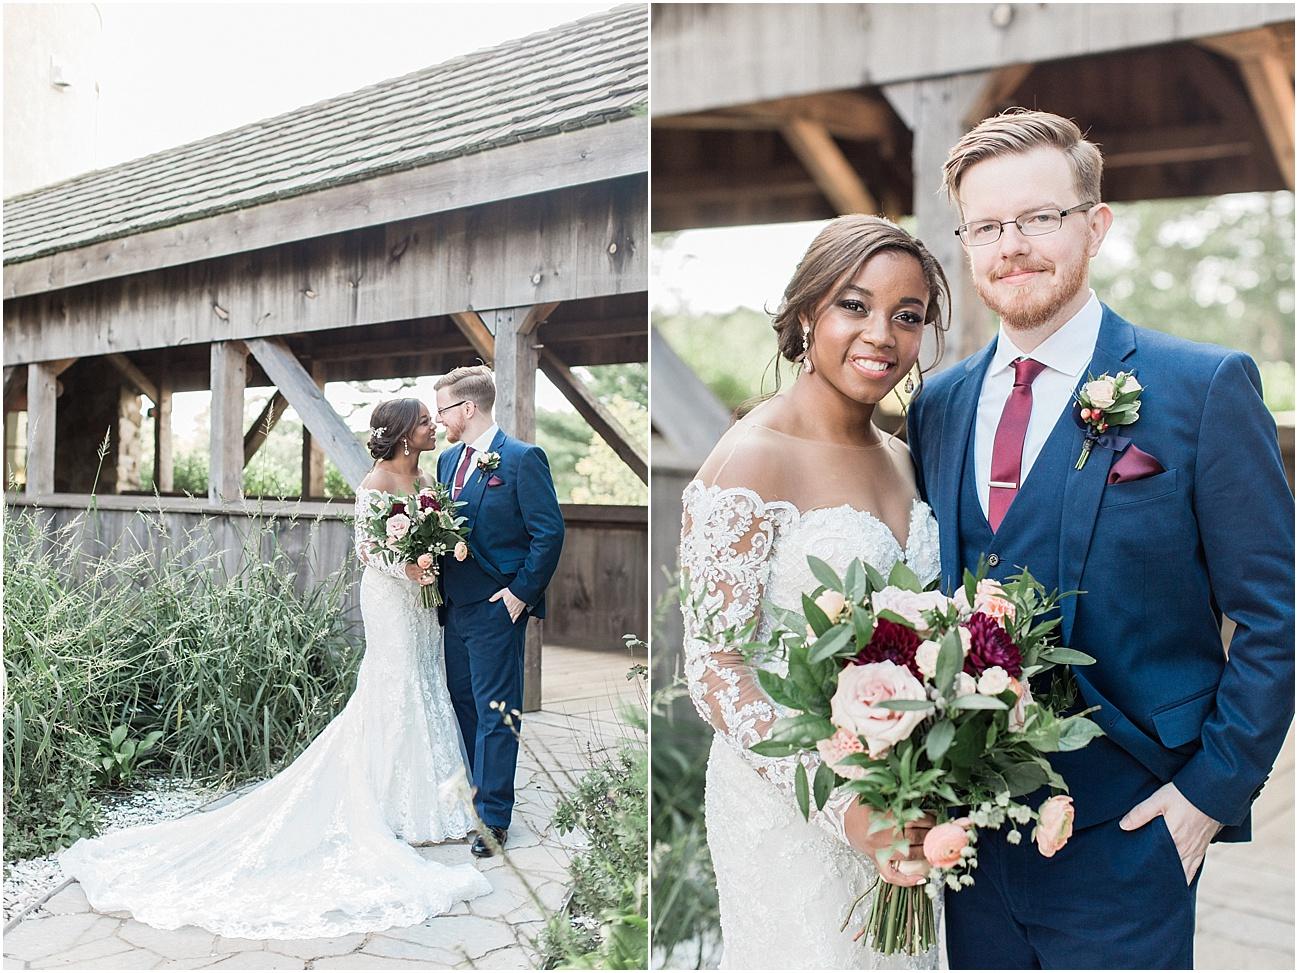 melissa_dan_the_pavilion_at_pine_hills_fall_wine_cape_cod_boston_wedding_photographer_meredith_jane_photography_photo_1172.jpg